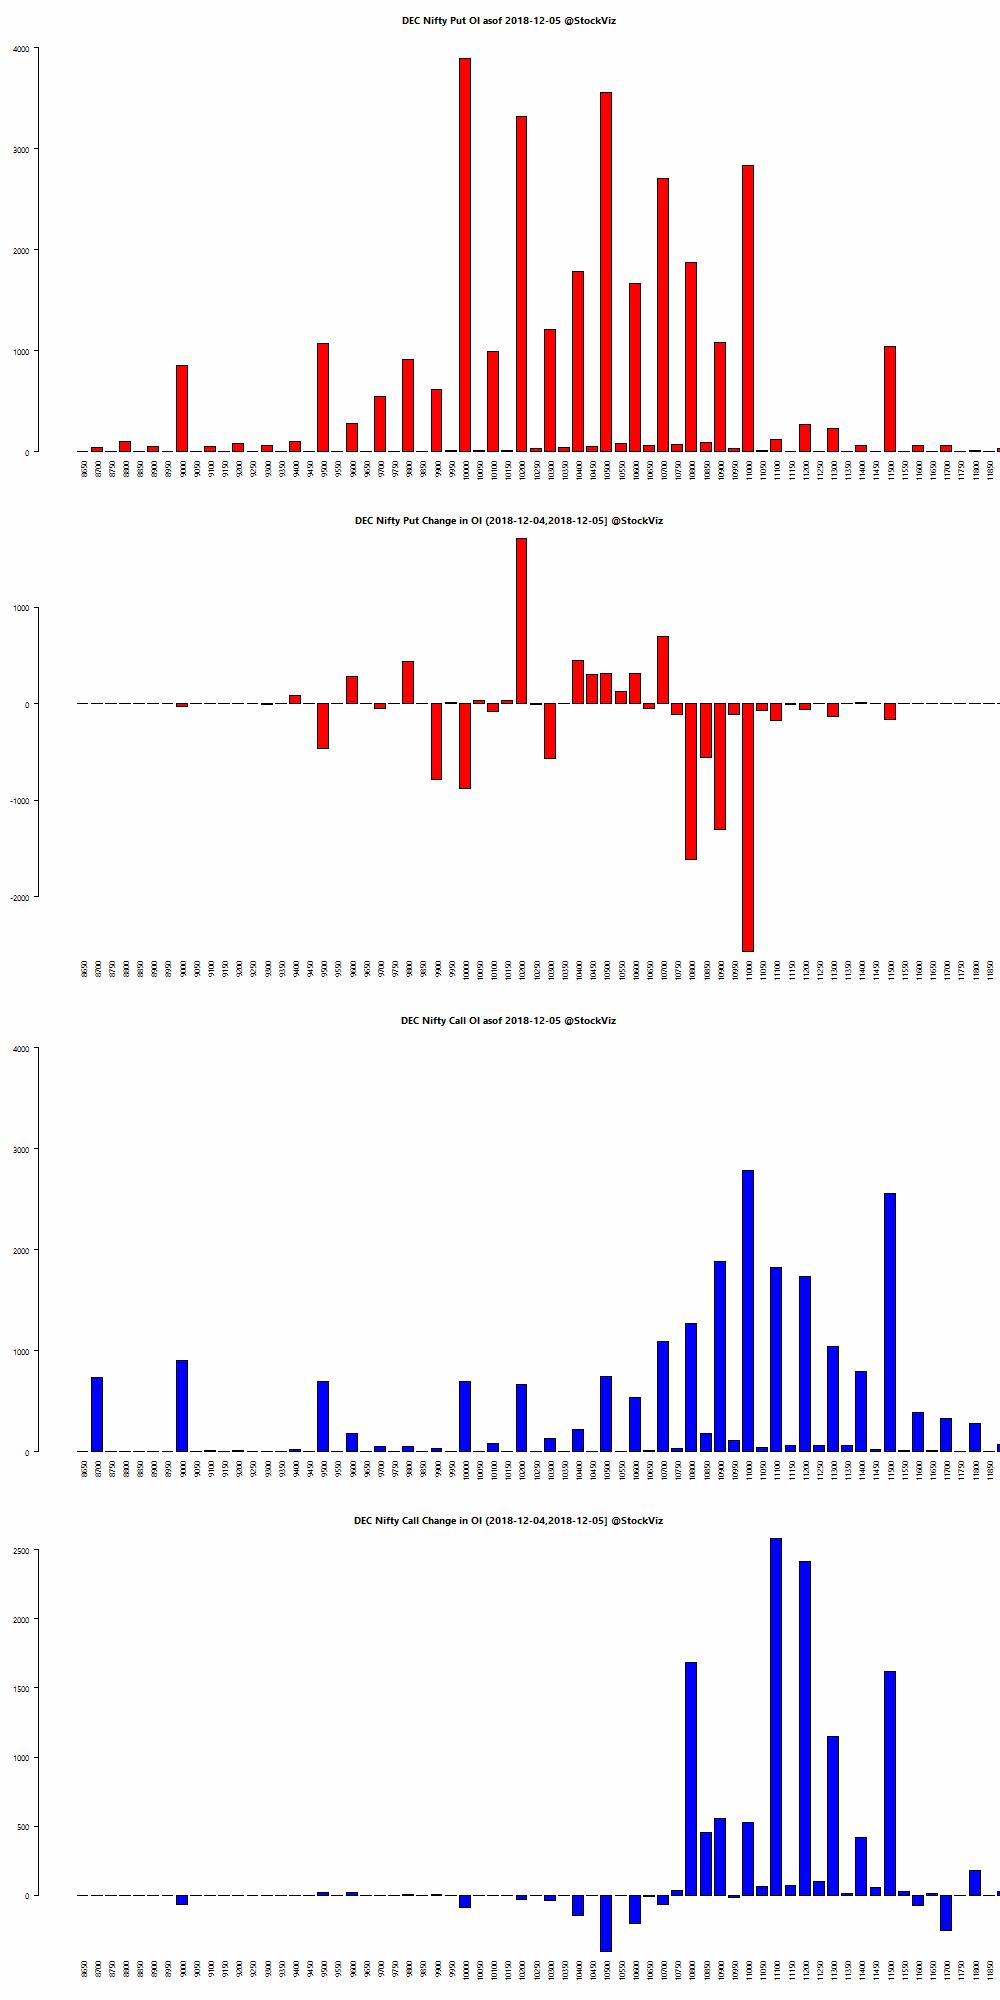 DEC NIFTY OI chart